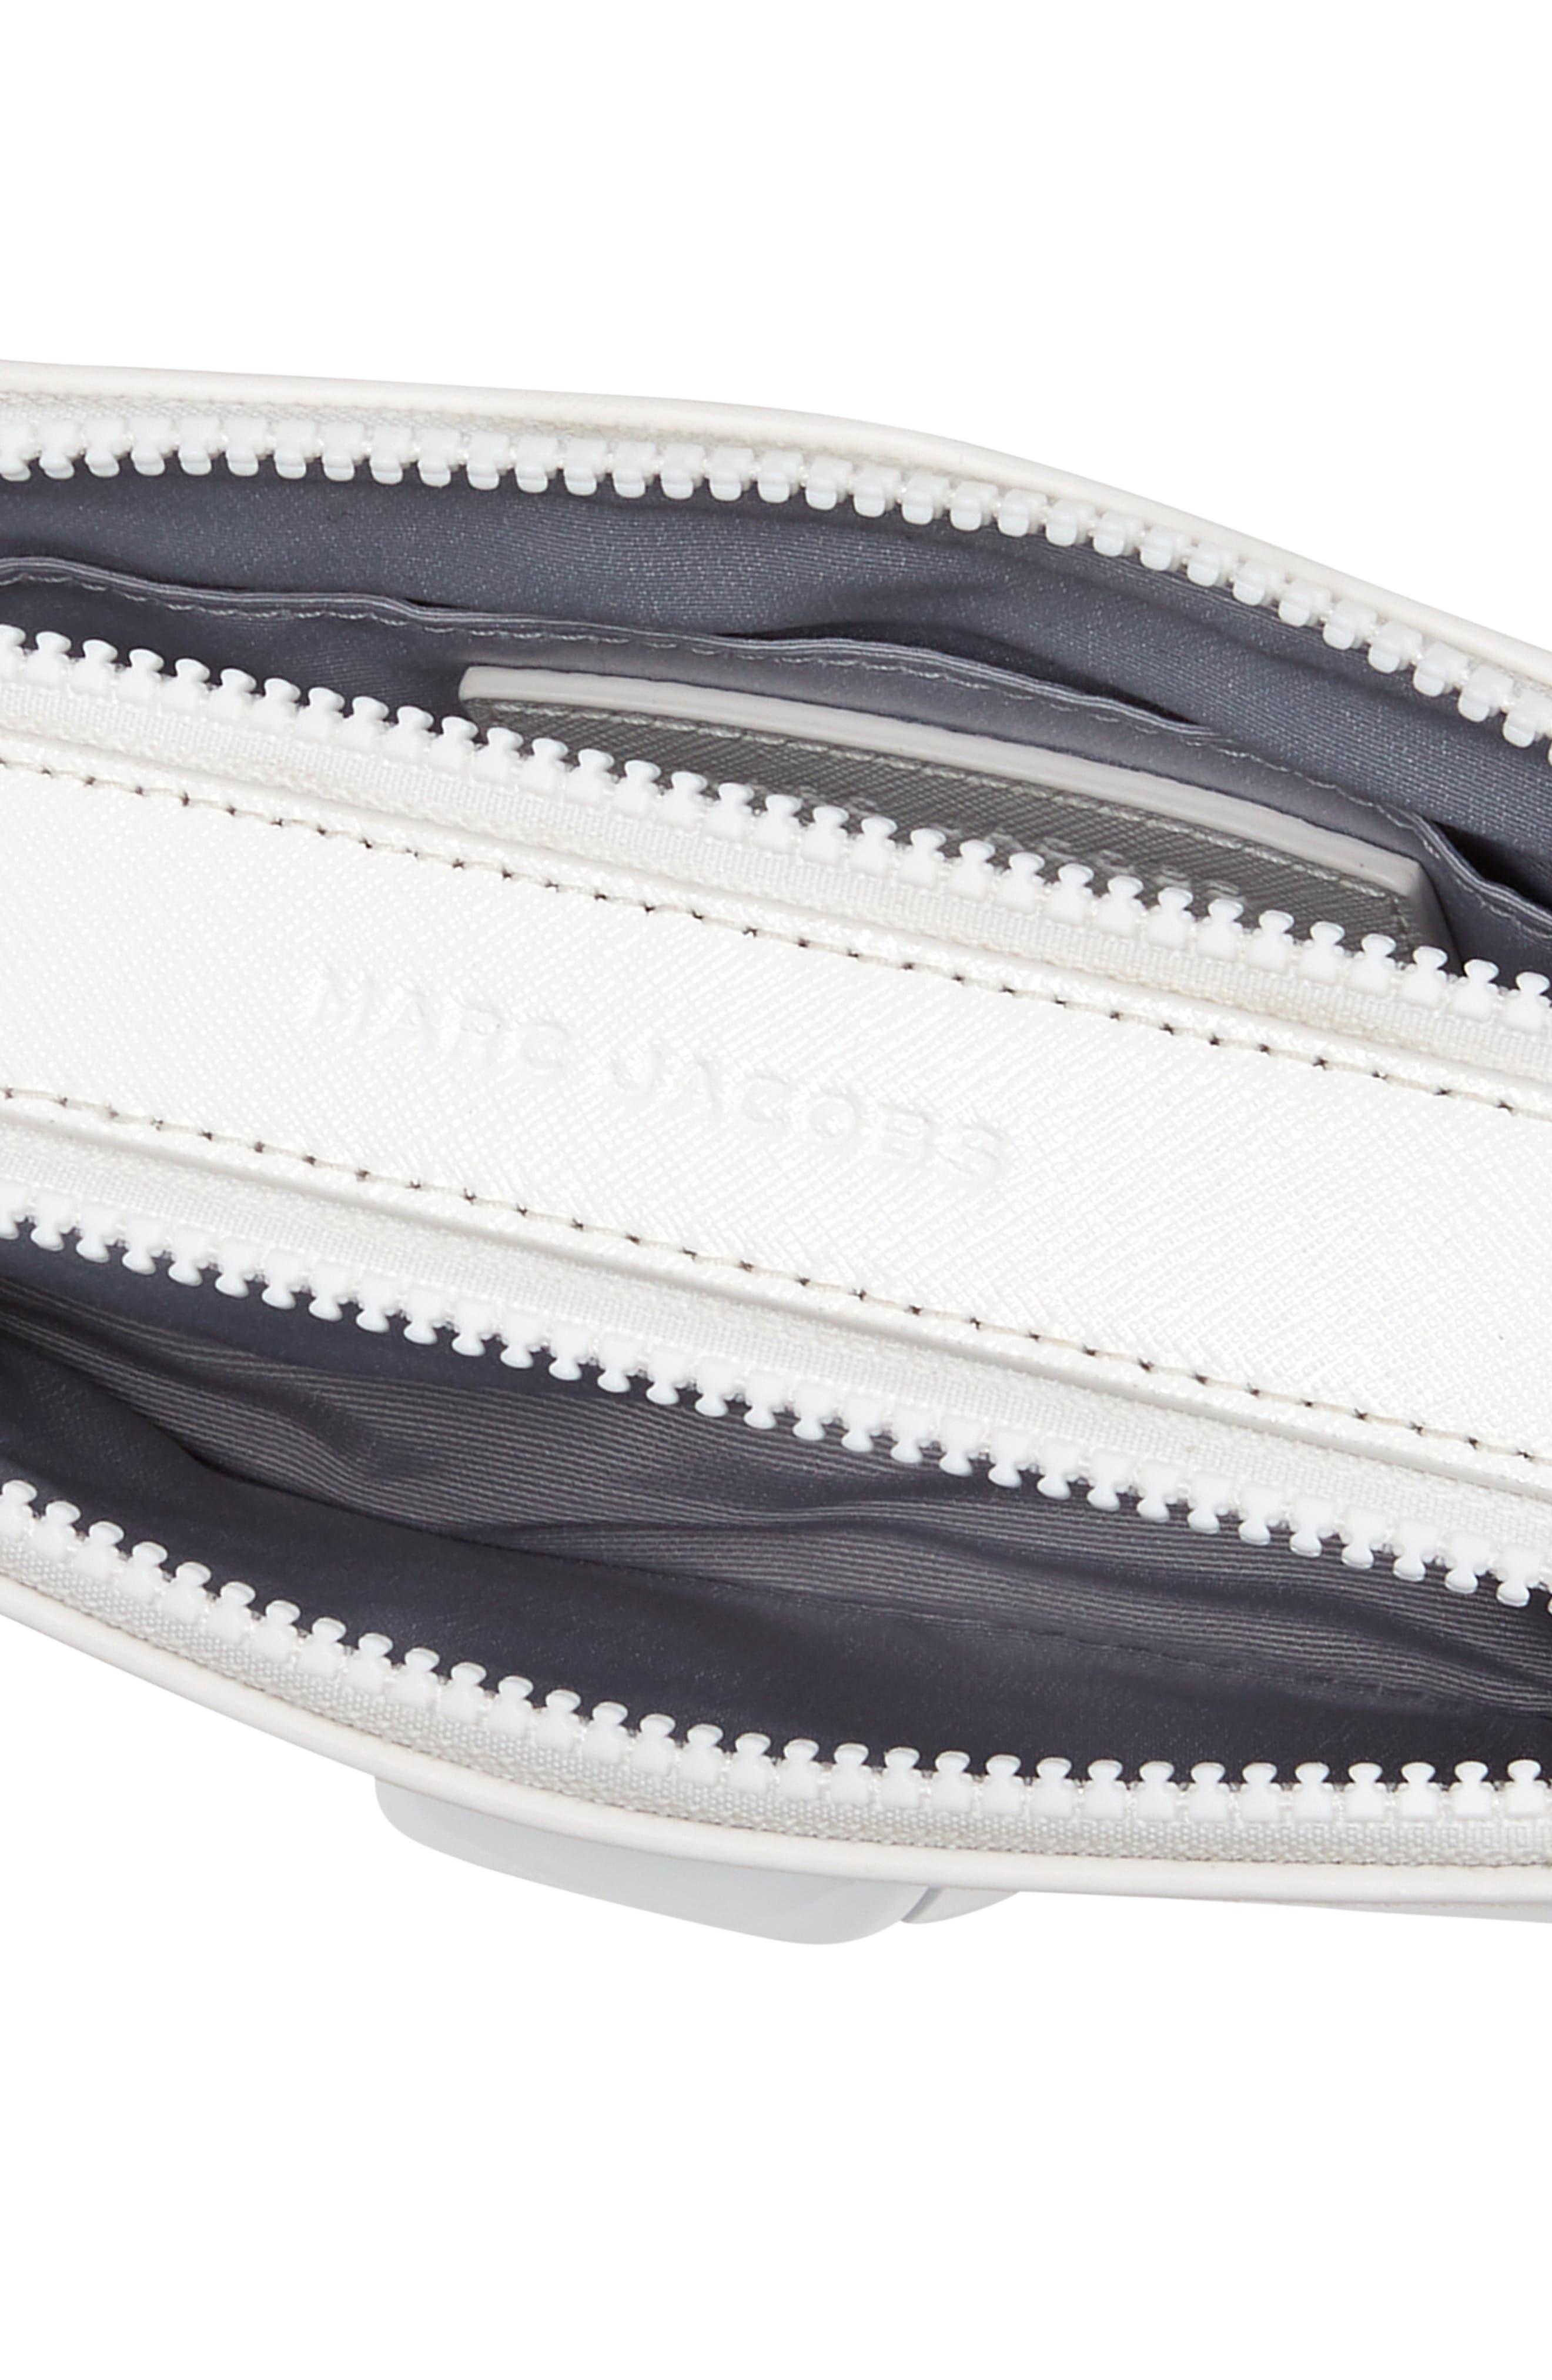 MARC JACOBS, Snapshot Leather Crossbody Bag, Alternate thumbnail 3, color, MOON WHITE